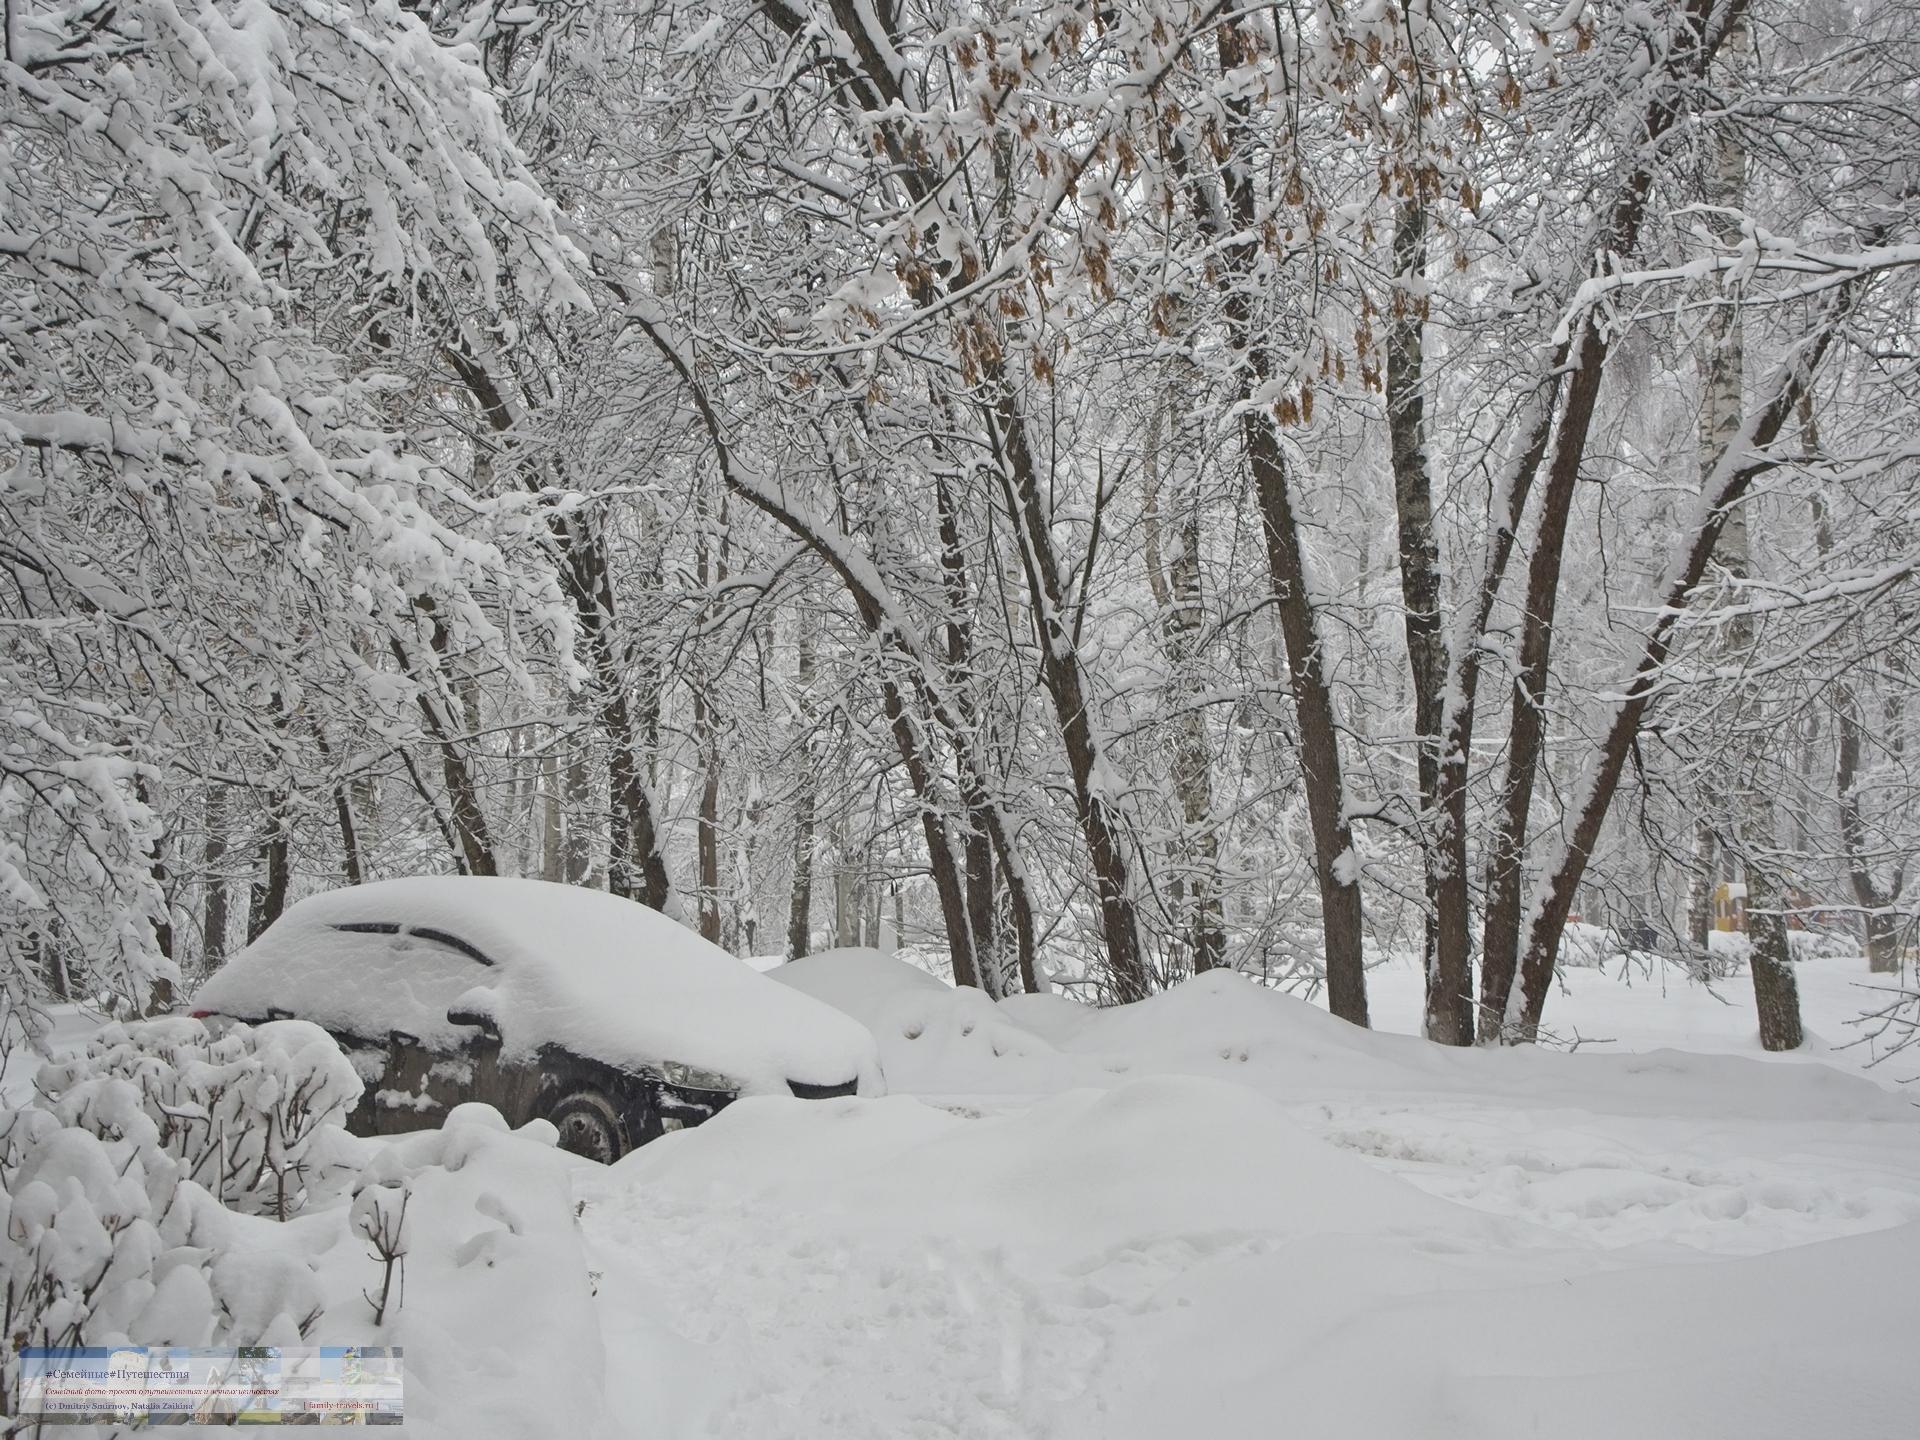 02042018-1336-Blog-084 Просто фото  Снегопад года